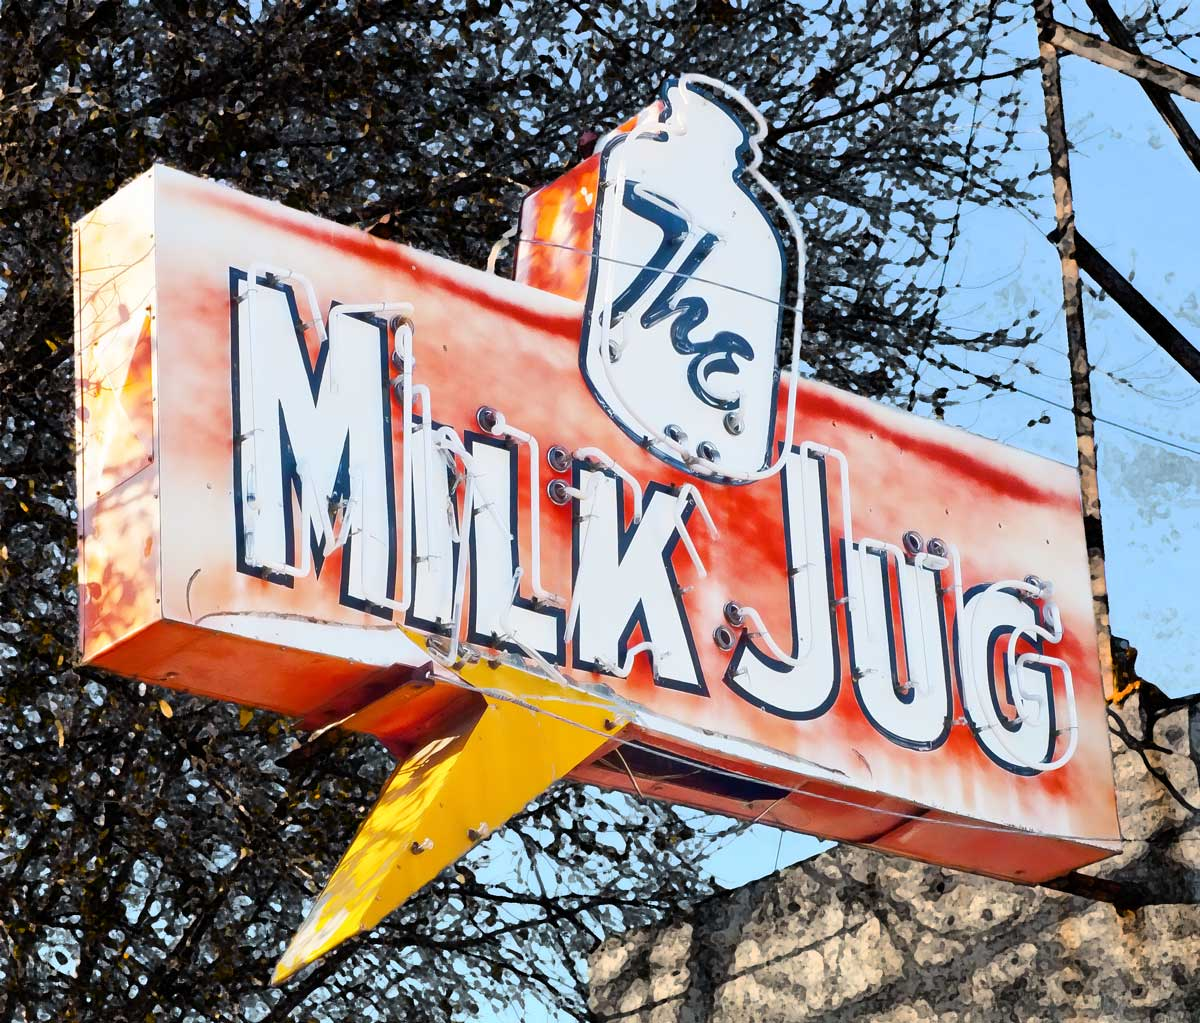 The Milk Jug - Independence, Missouri U.S.A. - November 23, 2011